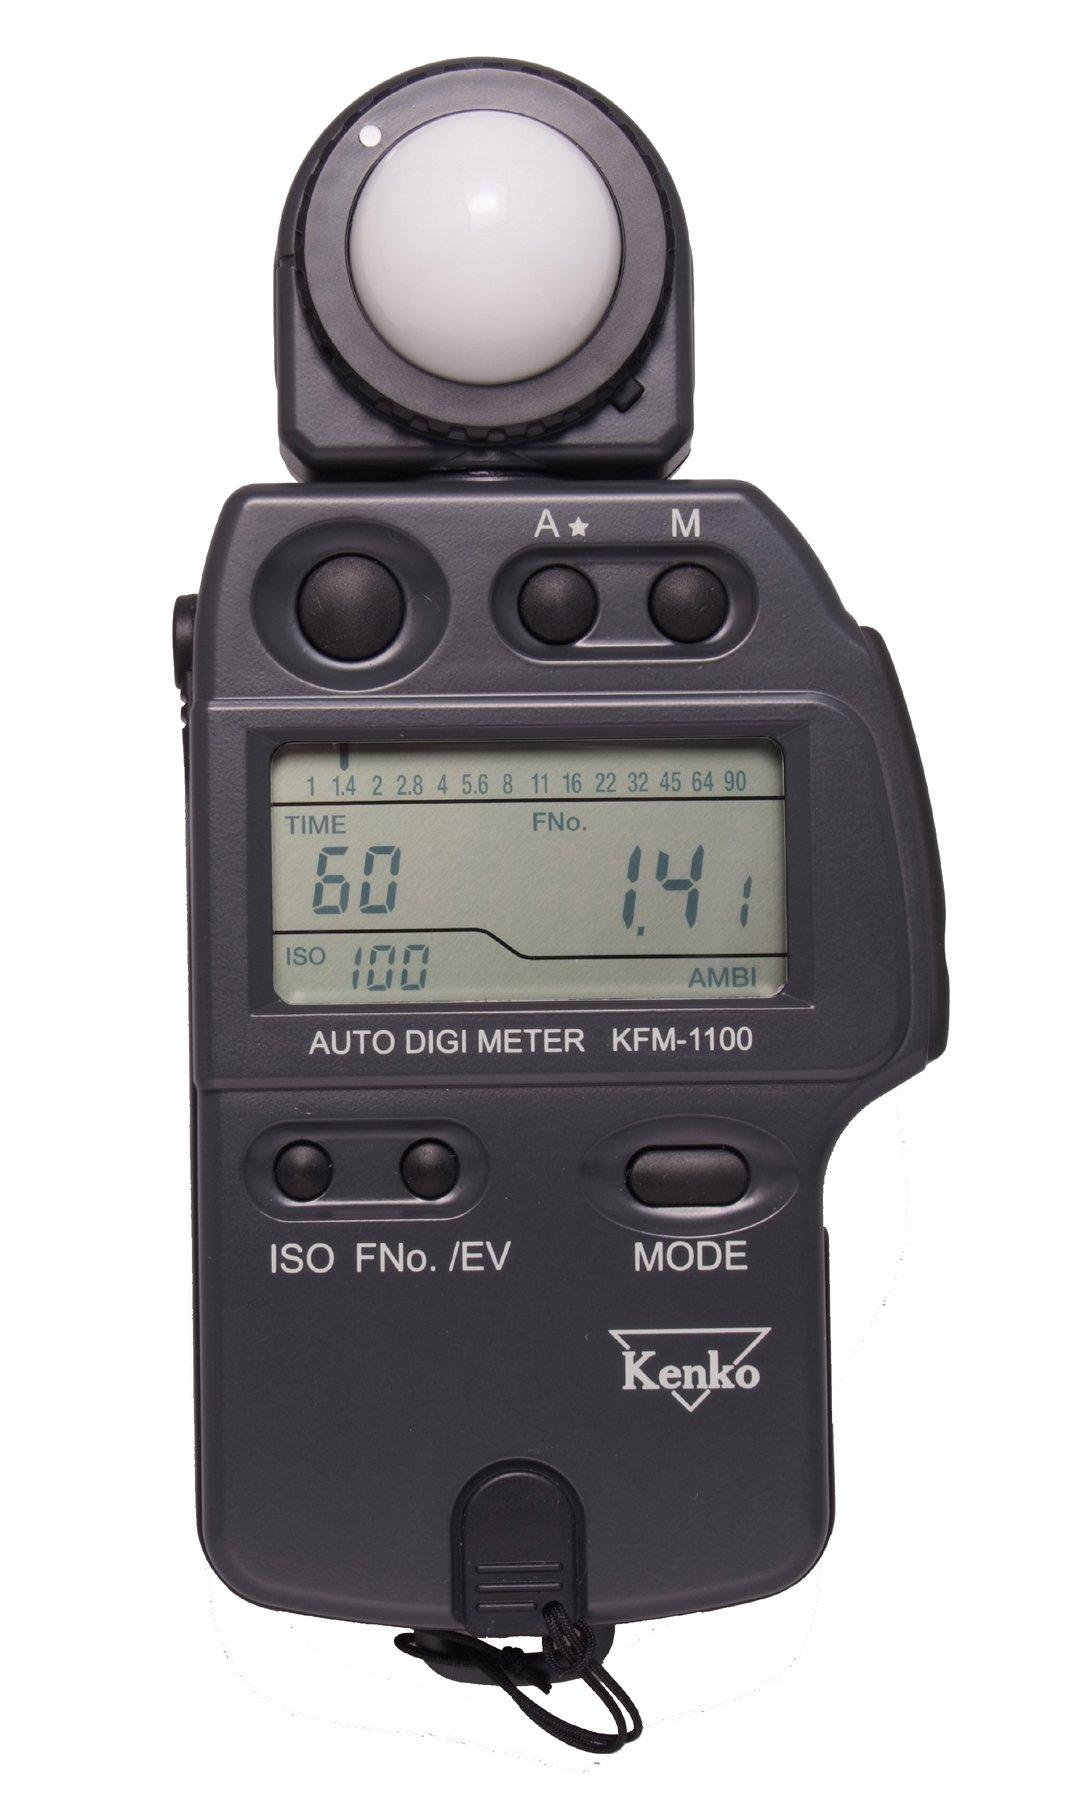 Kenko KFM-1100 Auto Digi Meter - Light Meter for Flash and Ambient Light by Kenko